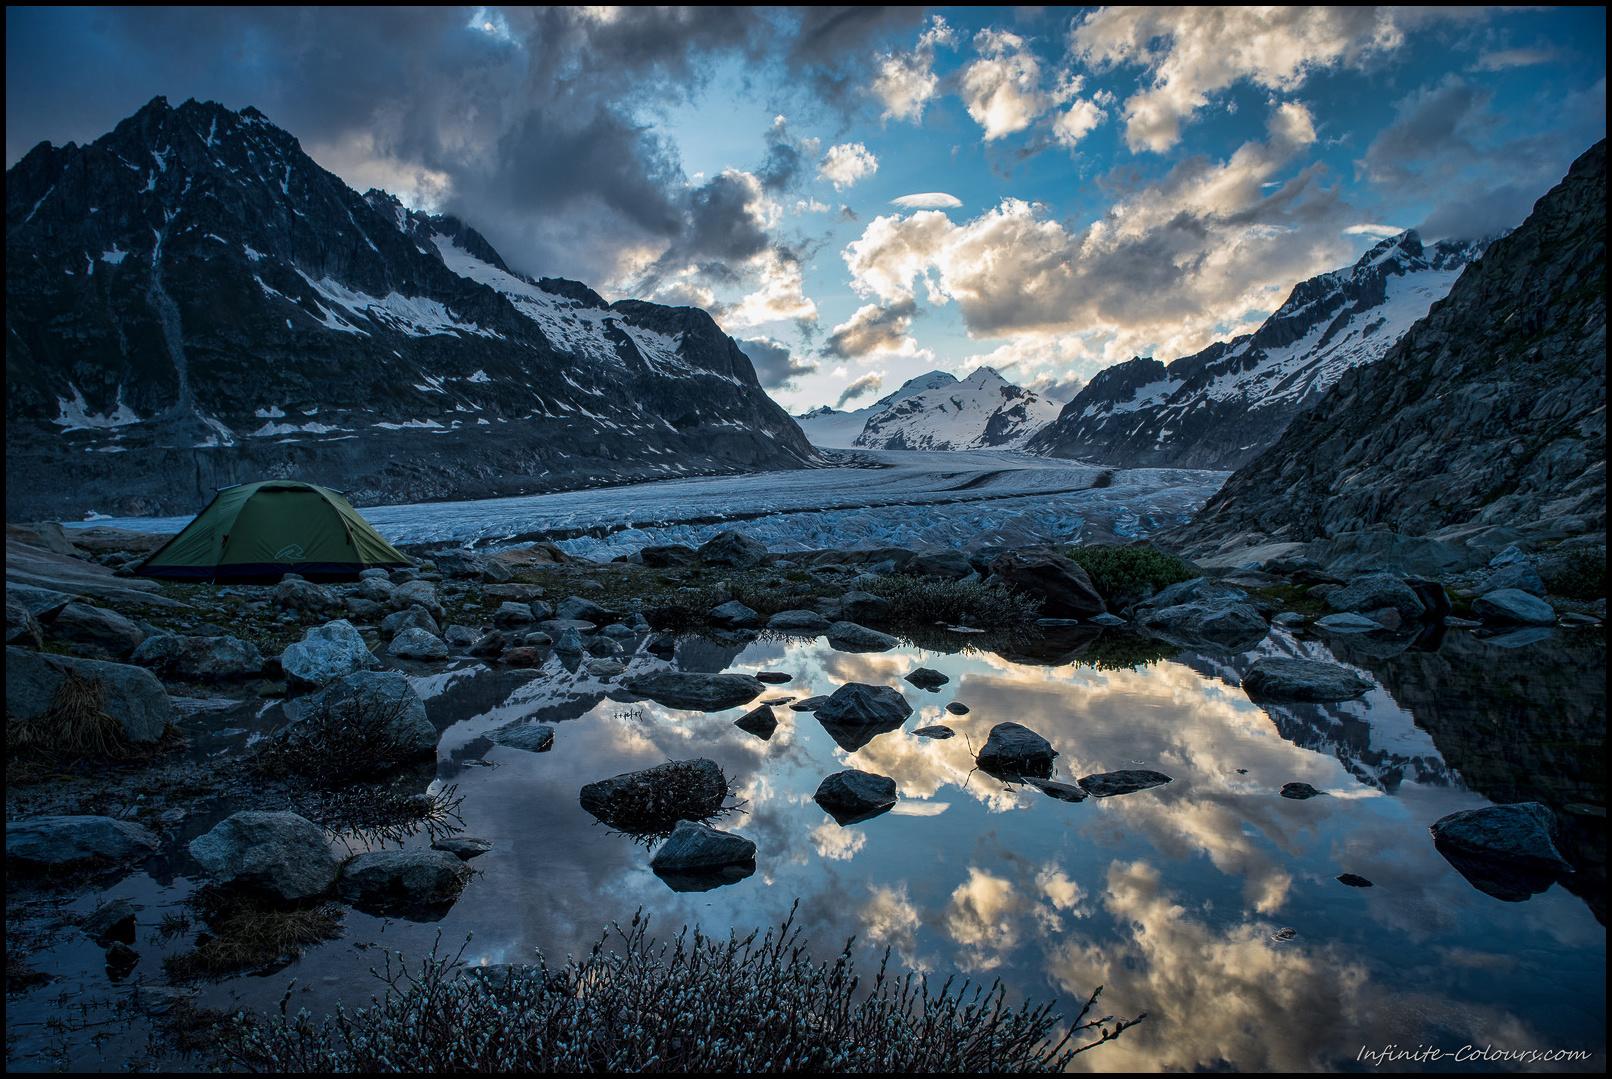 Jungfrau Aletsch glacier camp II